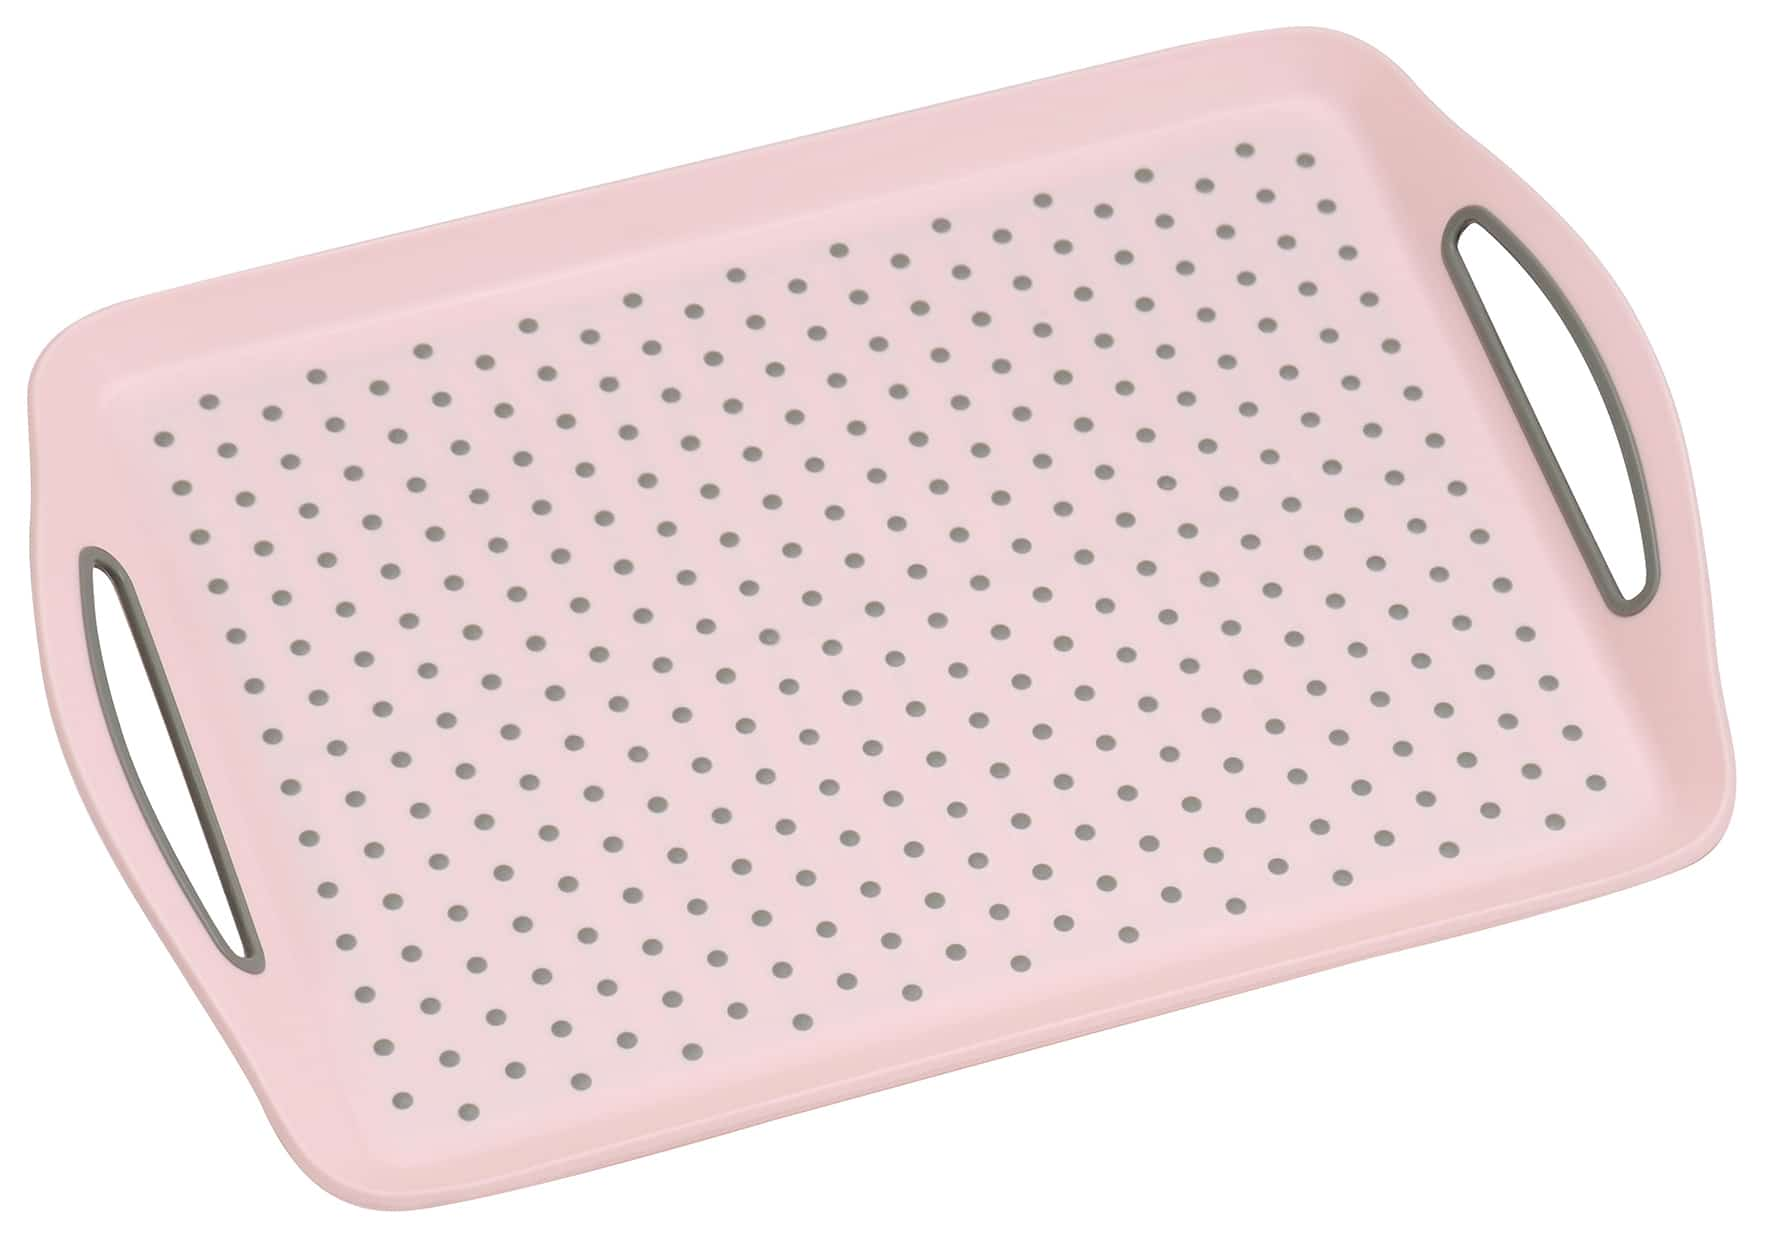 Anti-slip dienblad 45,5x32x4,5 cm - Dienblad Rechthoek - Roze